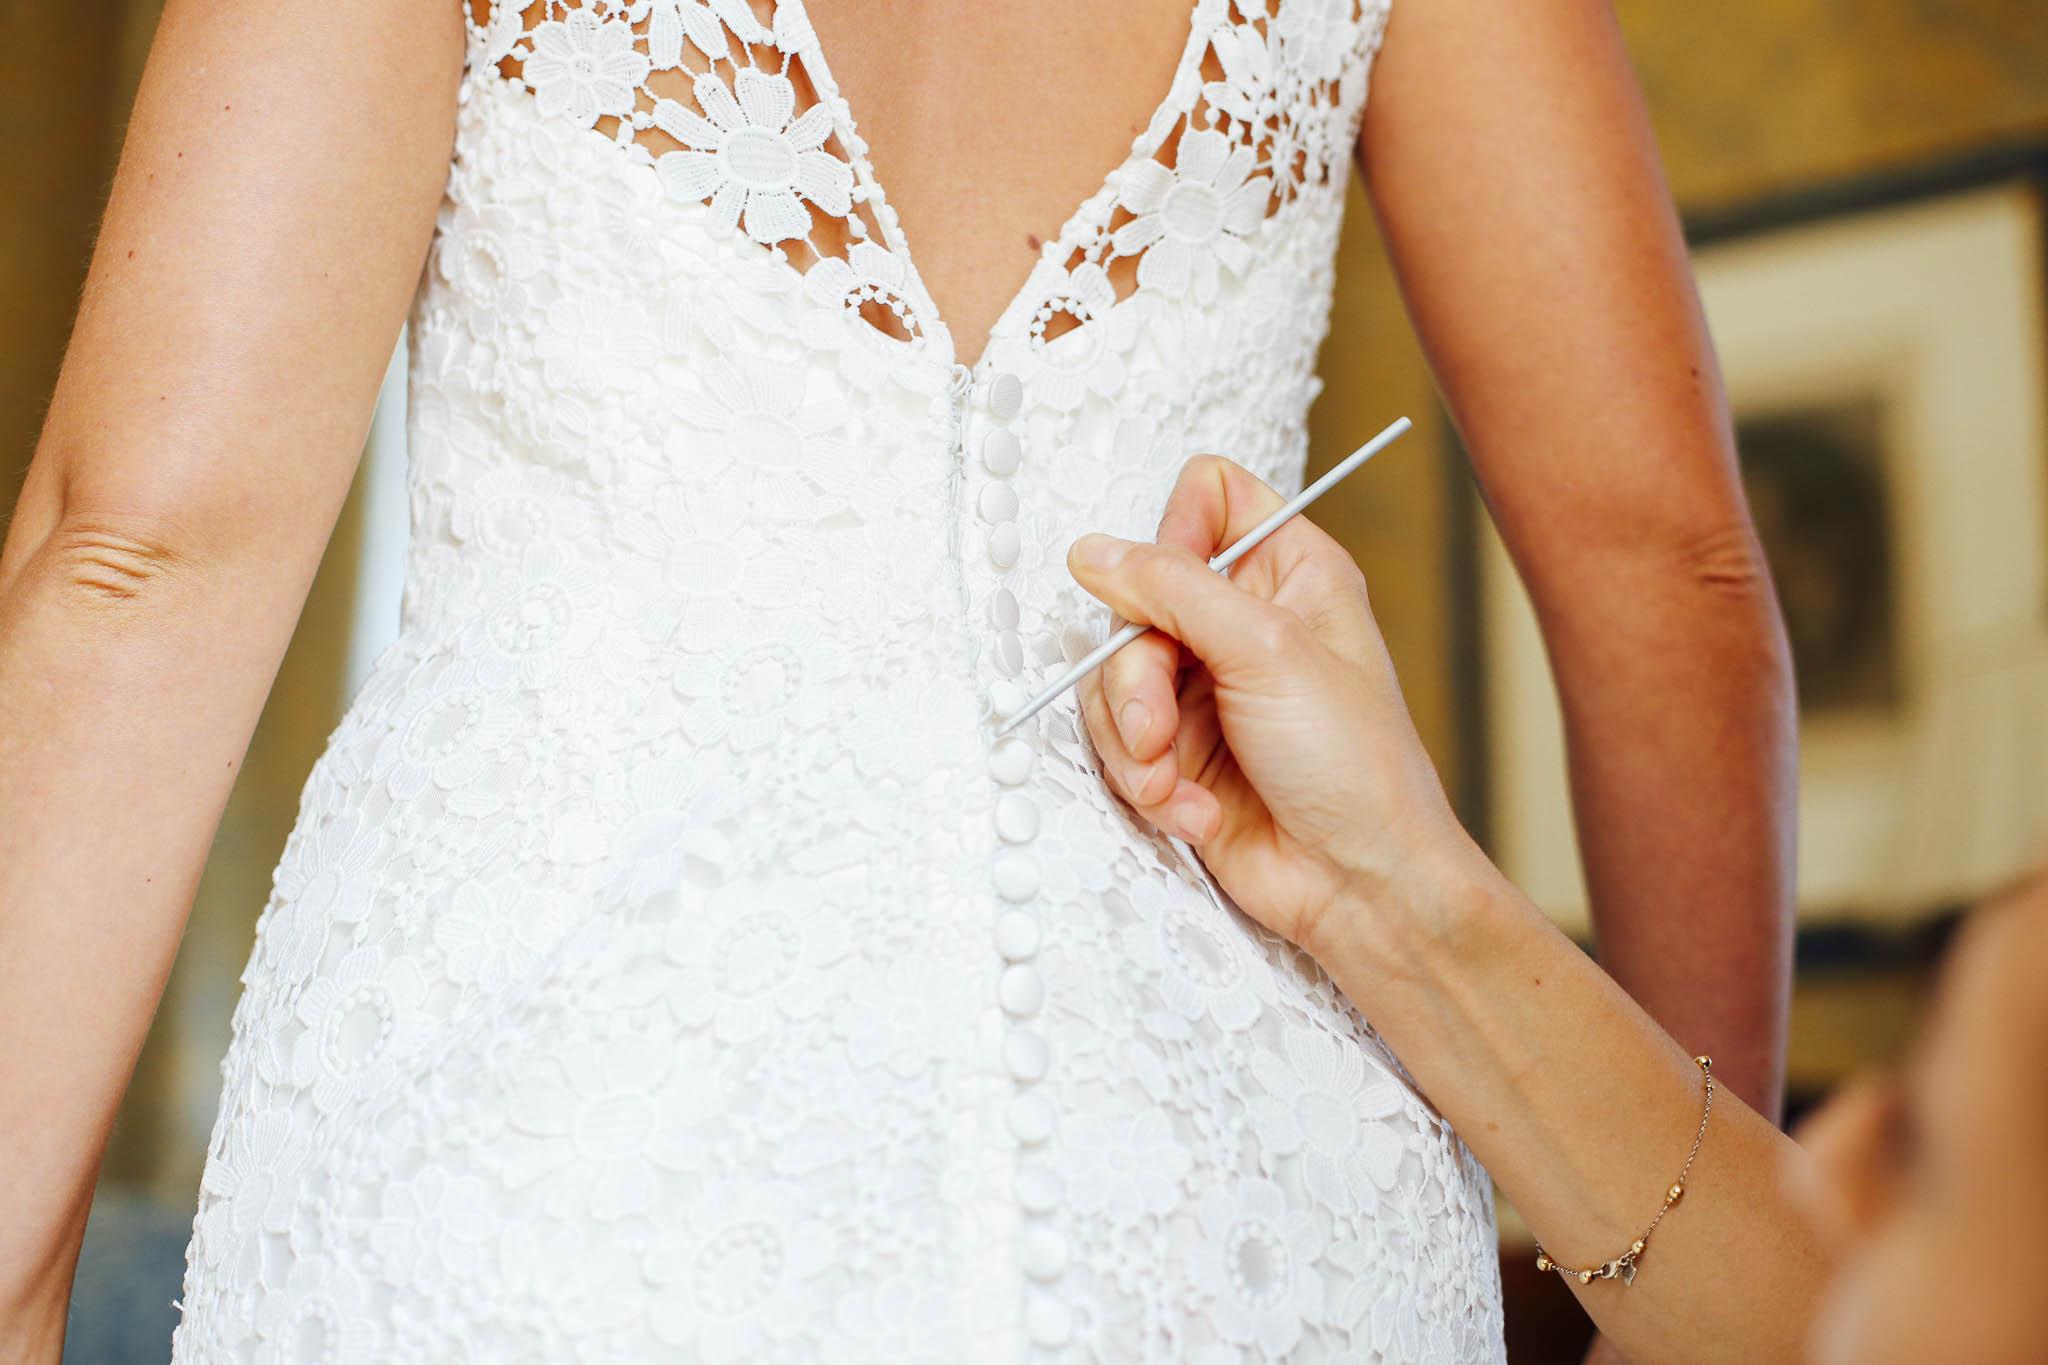 Sofia Gangi Wedding Planner Palermo Matrimonio Villa Igea preparativi Marco Lavinia (6)-min